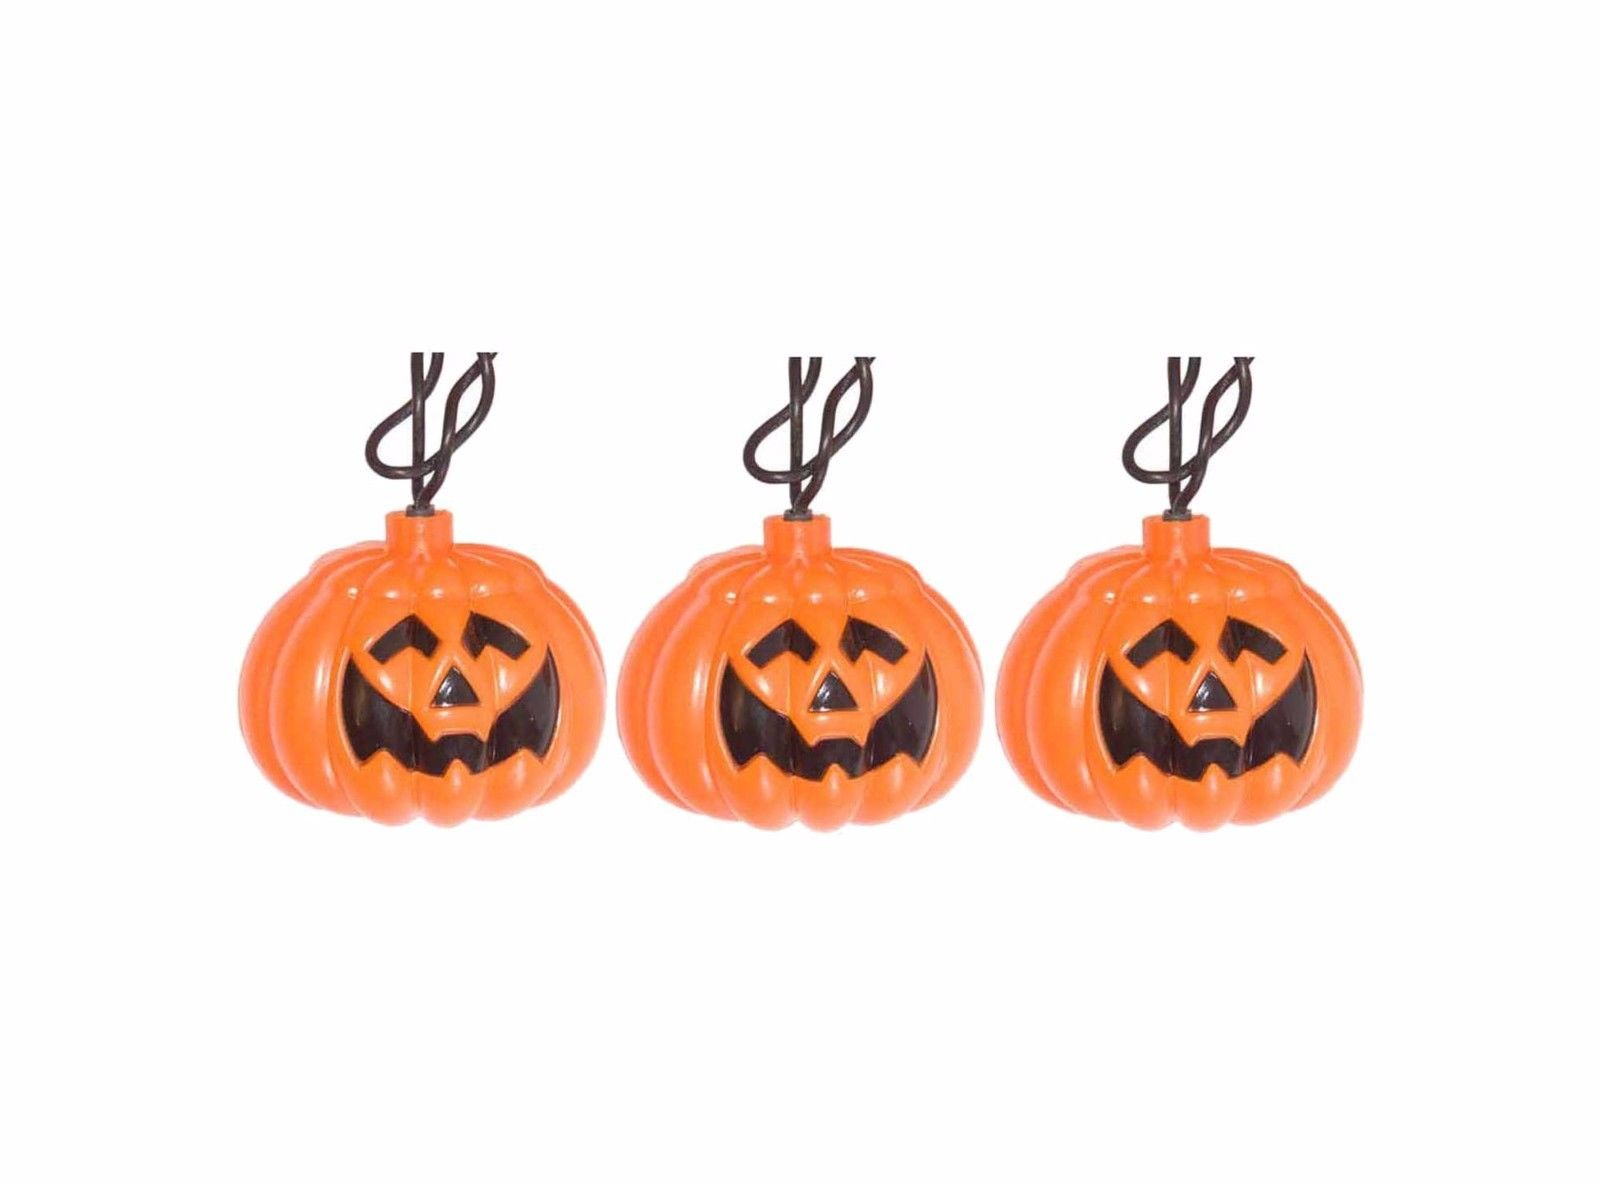 Pumpkin Jack-O-Lantern Light Set